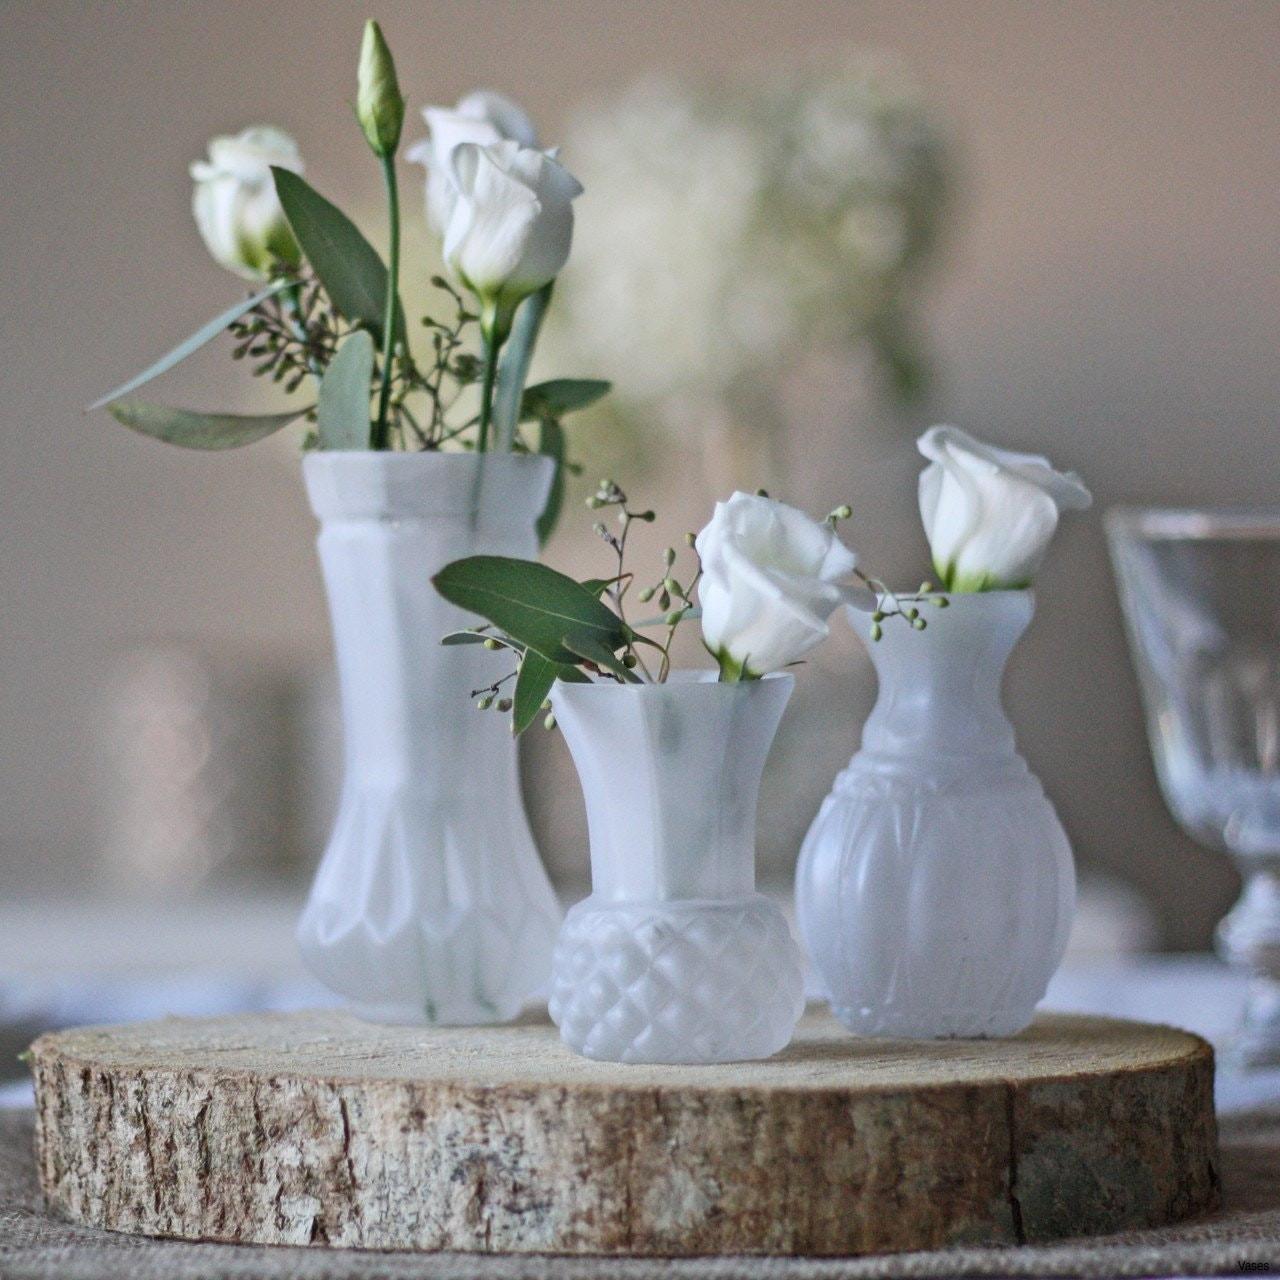 11 Trendy White Terracotta Vase 2021 free download white terracotta vase of decorative jars and vases gallery 10 beautiful mason jar decor ideas with regard to decorative jars and vases pictures jar flower 1h vases bud wedding vase centerpie